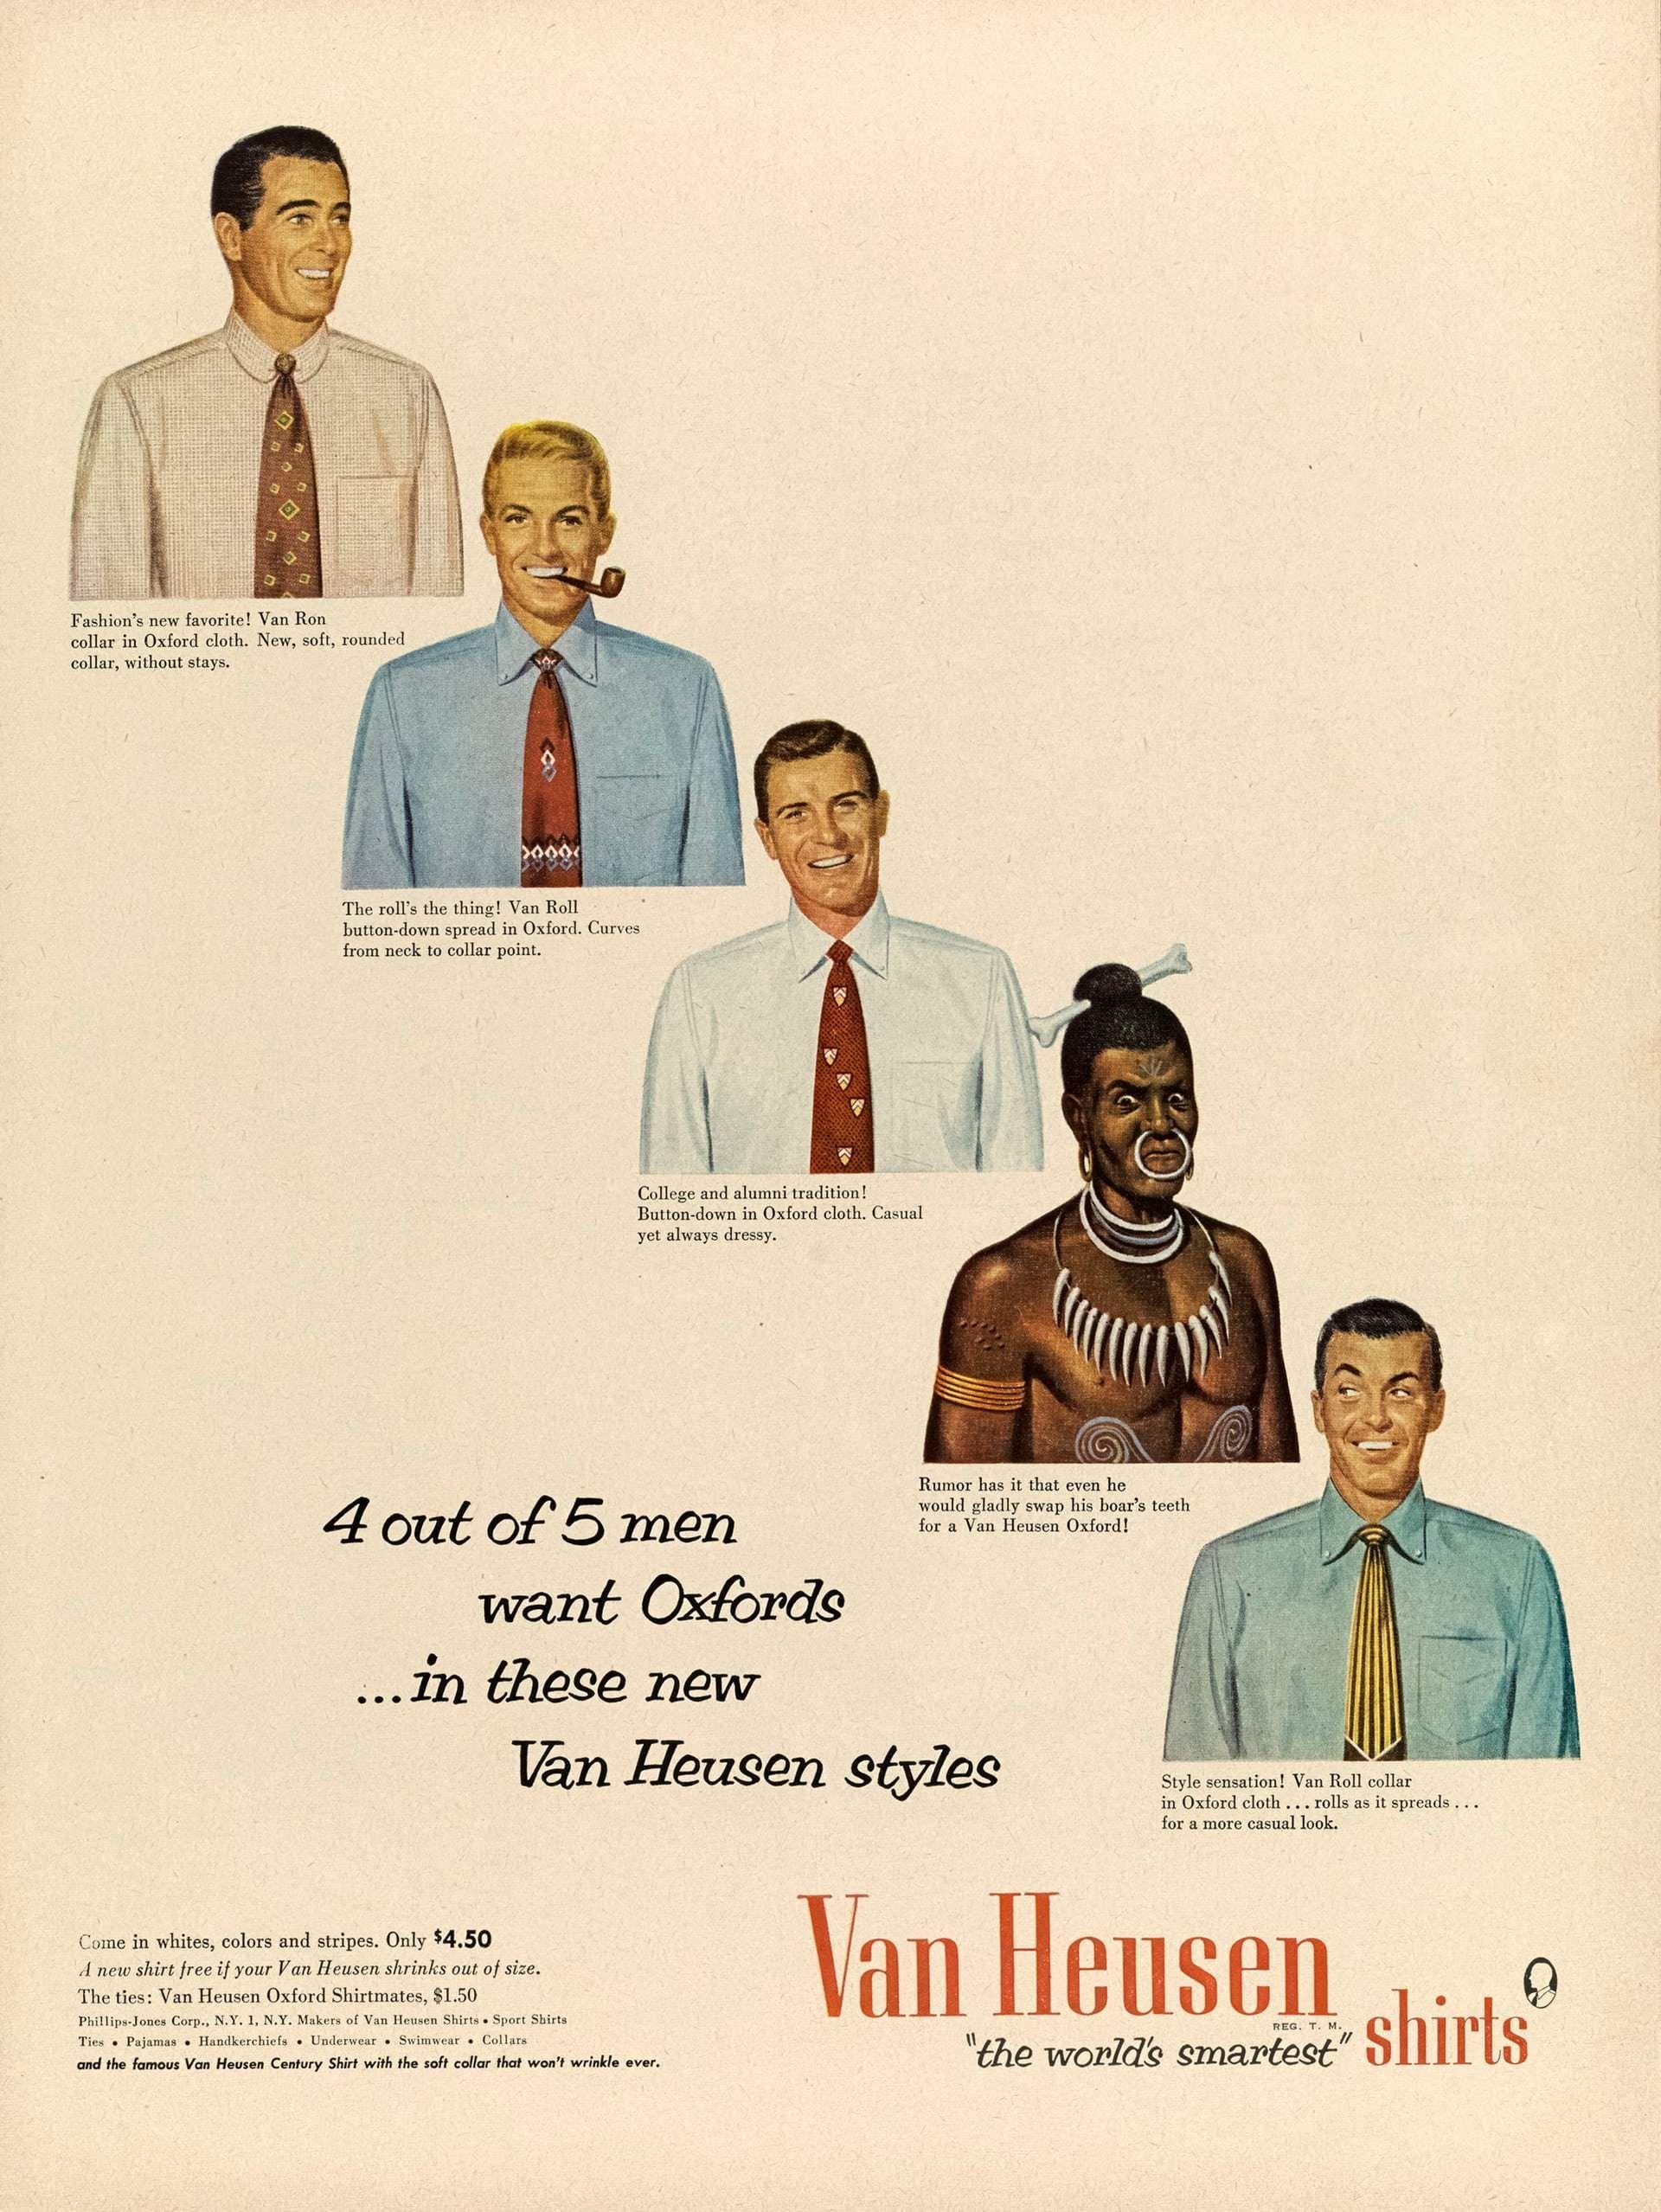 02106227d2 The worlds smartest shirts Van Heusen 1952  vintageads  Ads  vintage   PrintAd  tvads  advertising  BrandScience  influence  online  Facebook   submissions ...